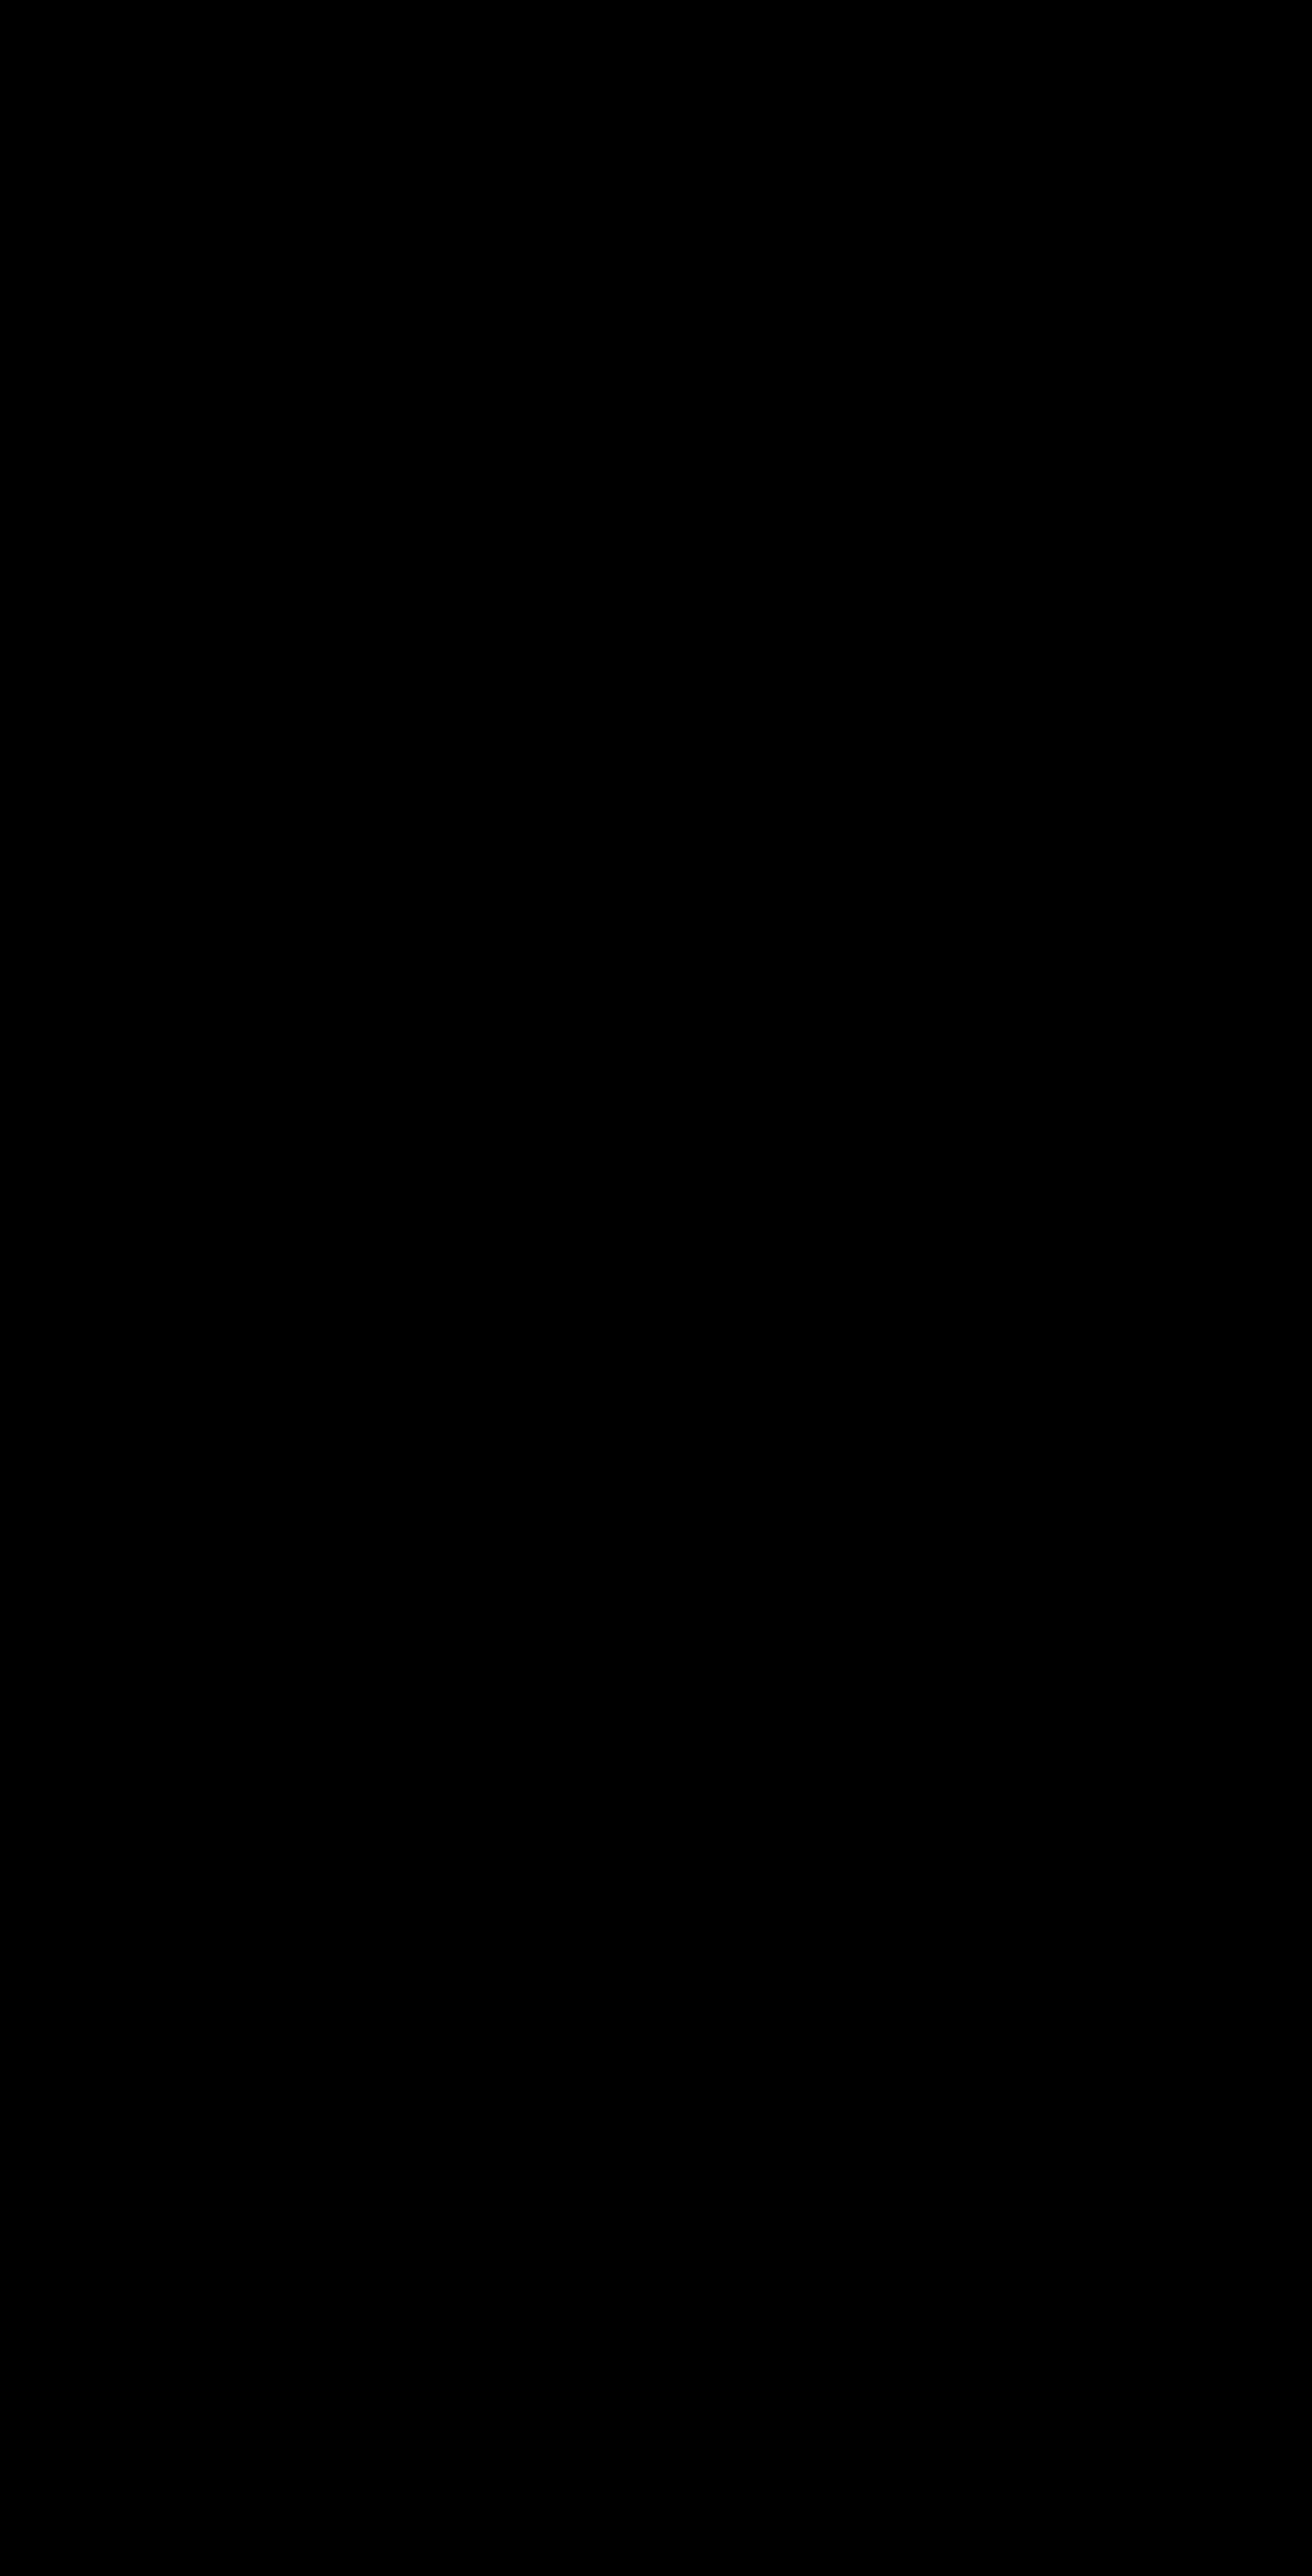 Caslon-graphique-billboard